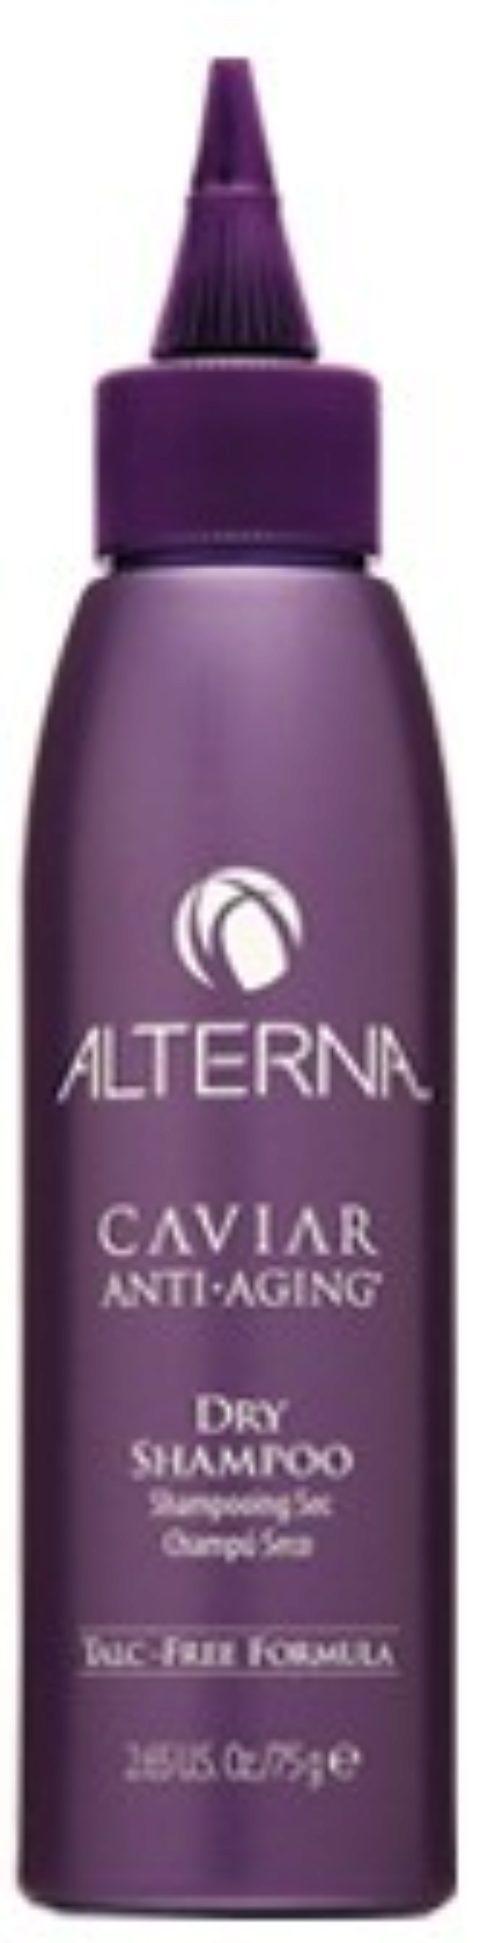 Alterna Caviar Anti aging Dry shampoo 75gr - shampooing sec